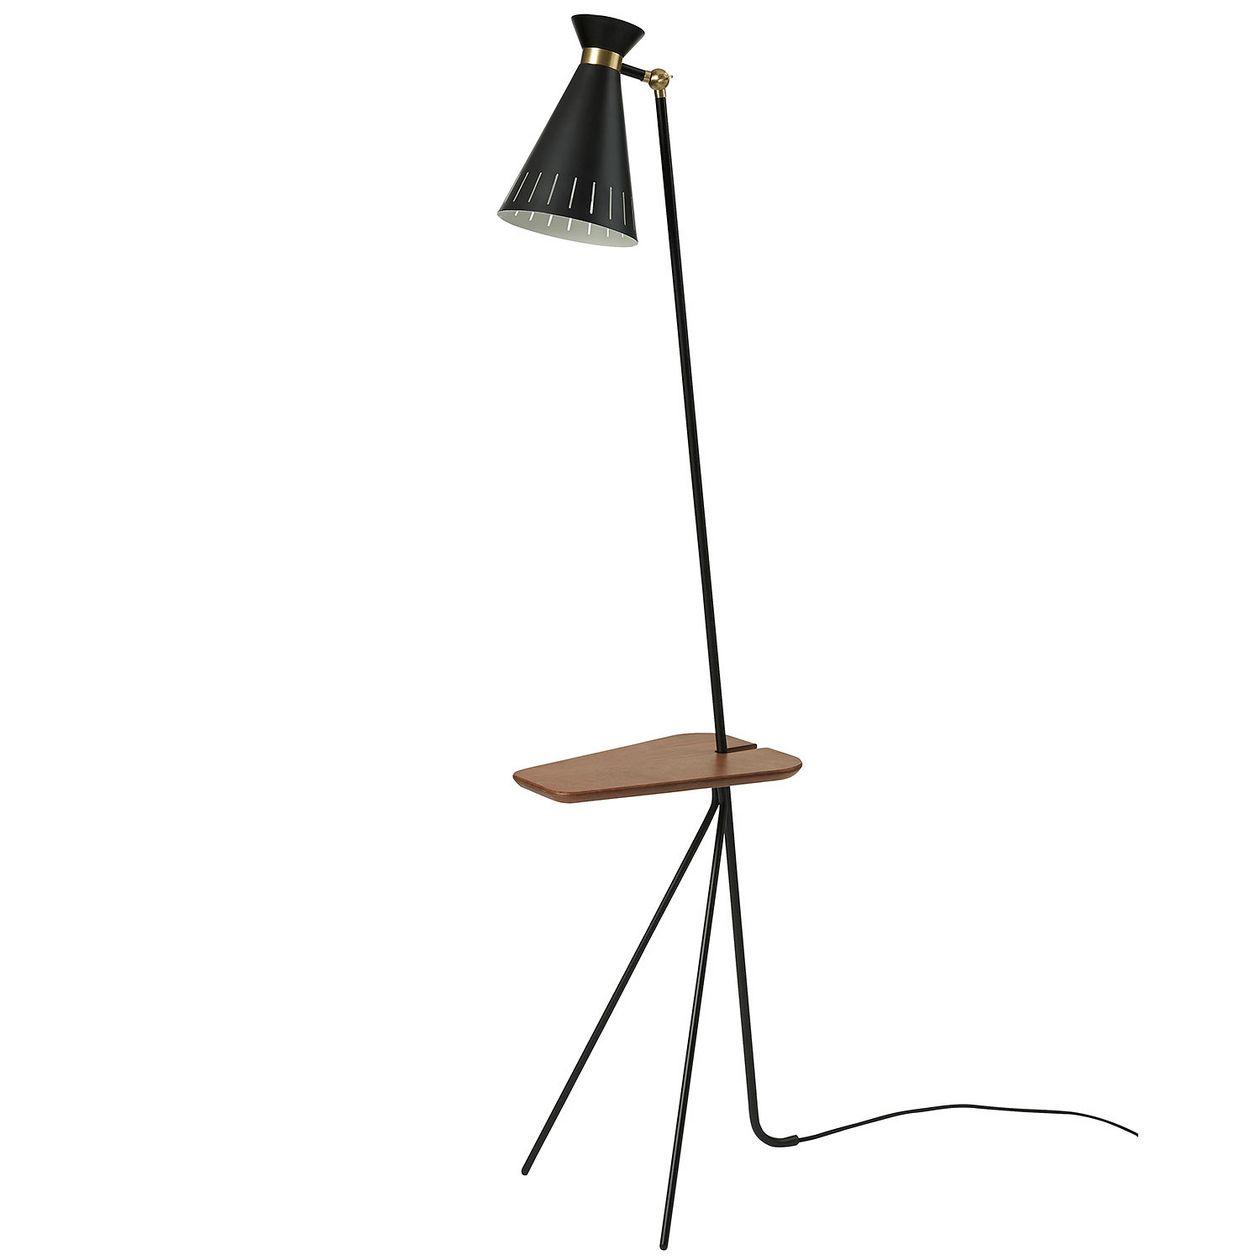 Warm Nordic's Cone floor lamp